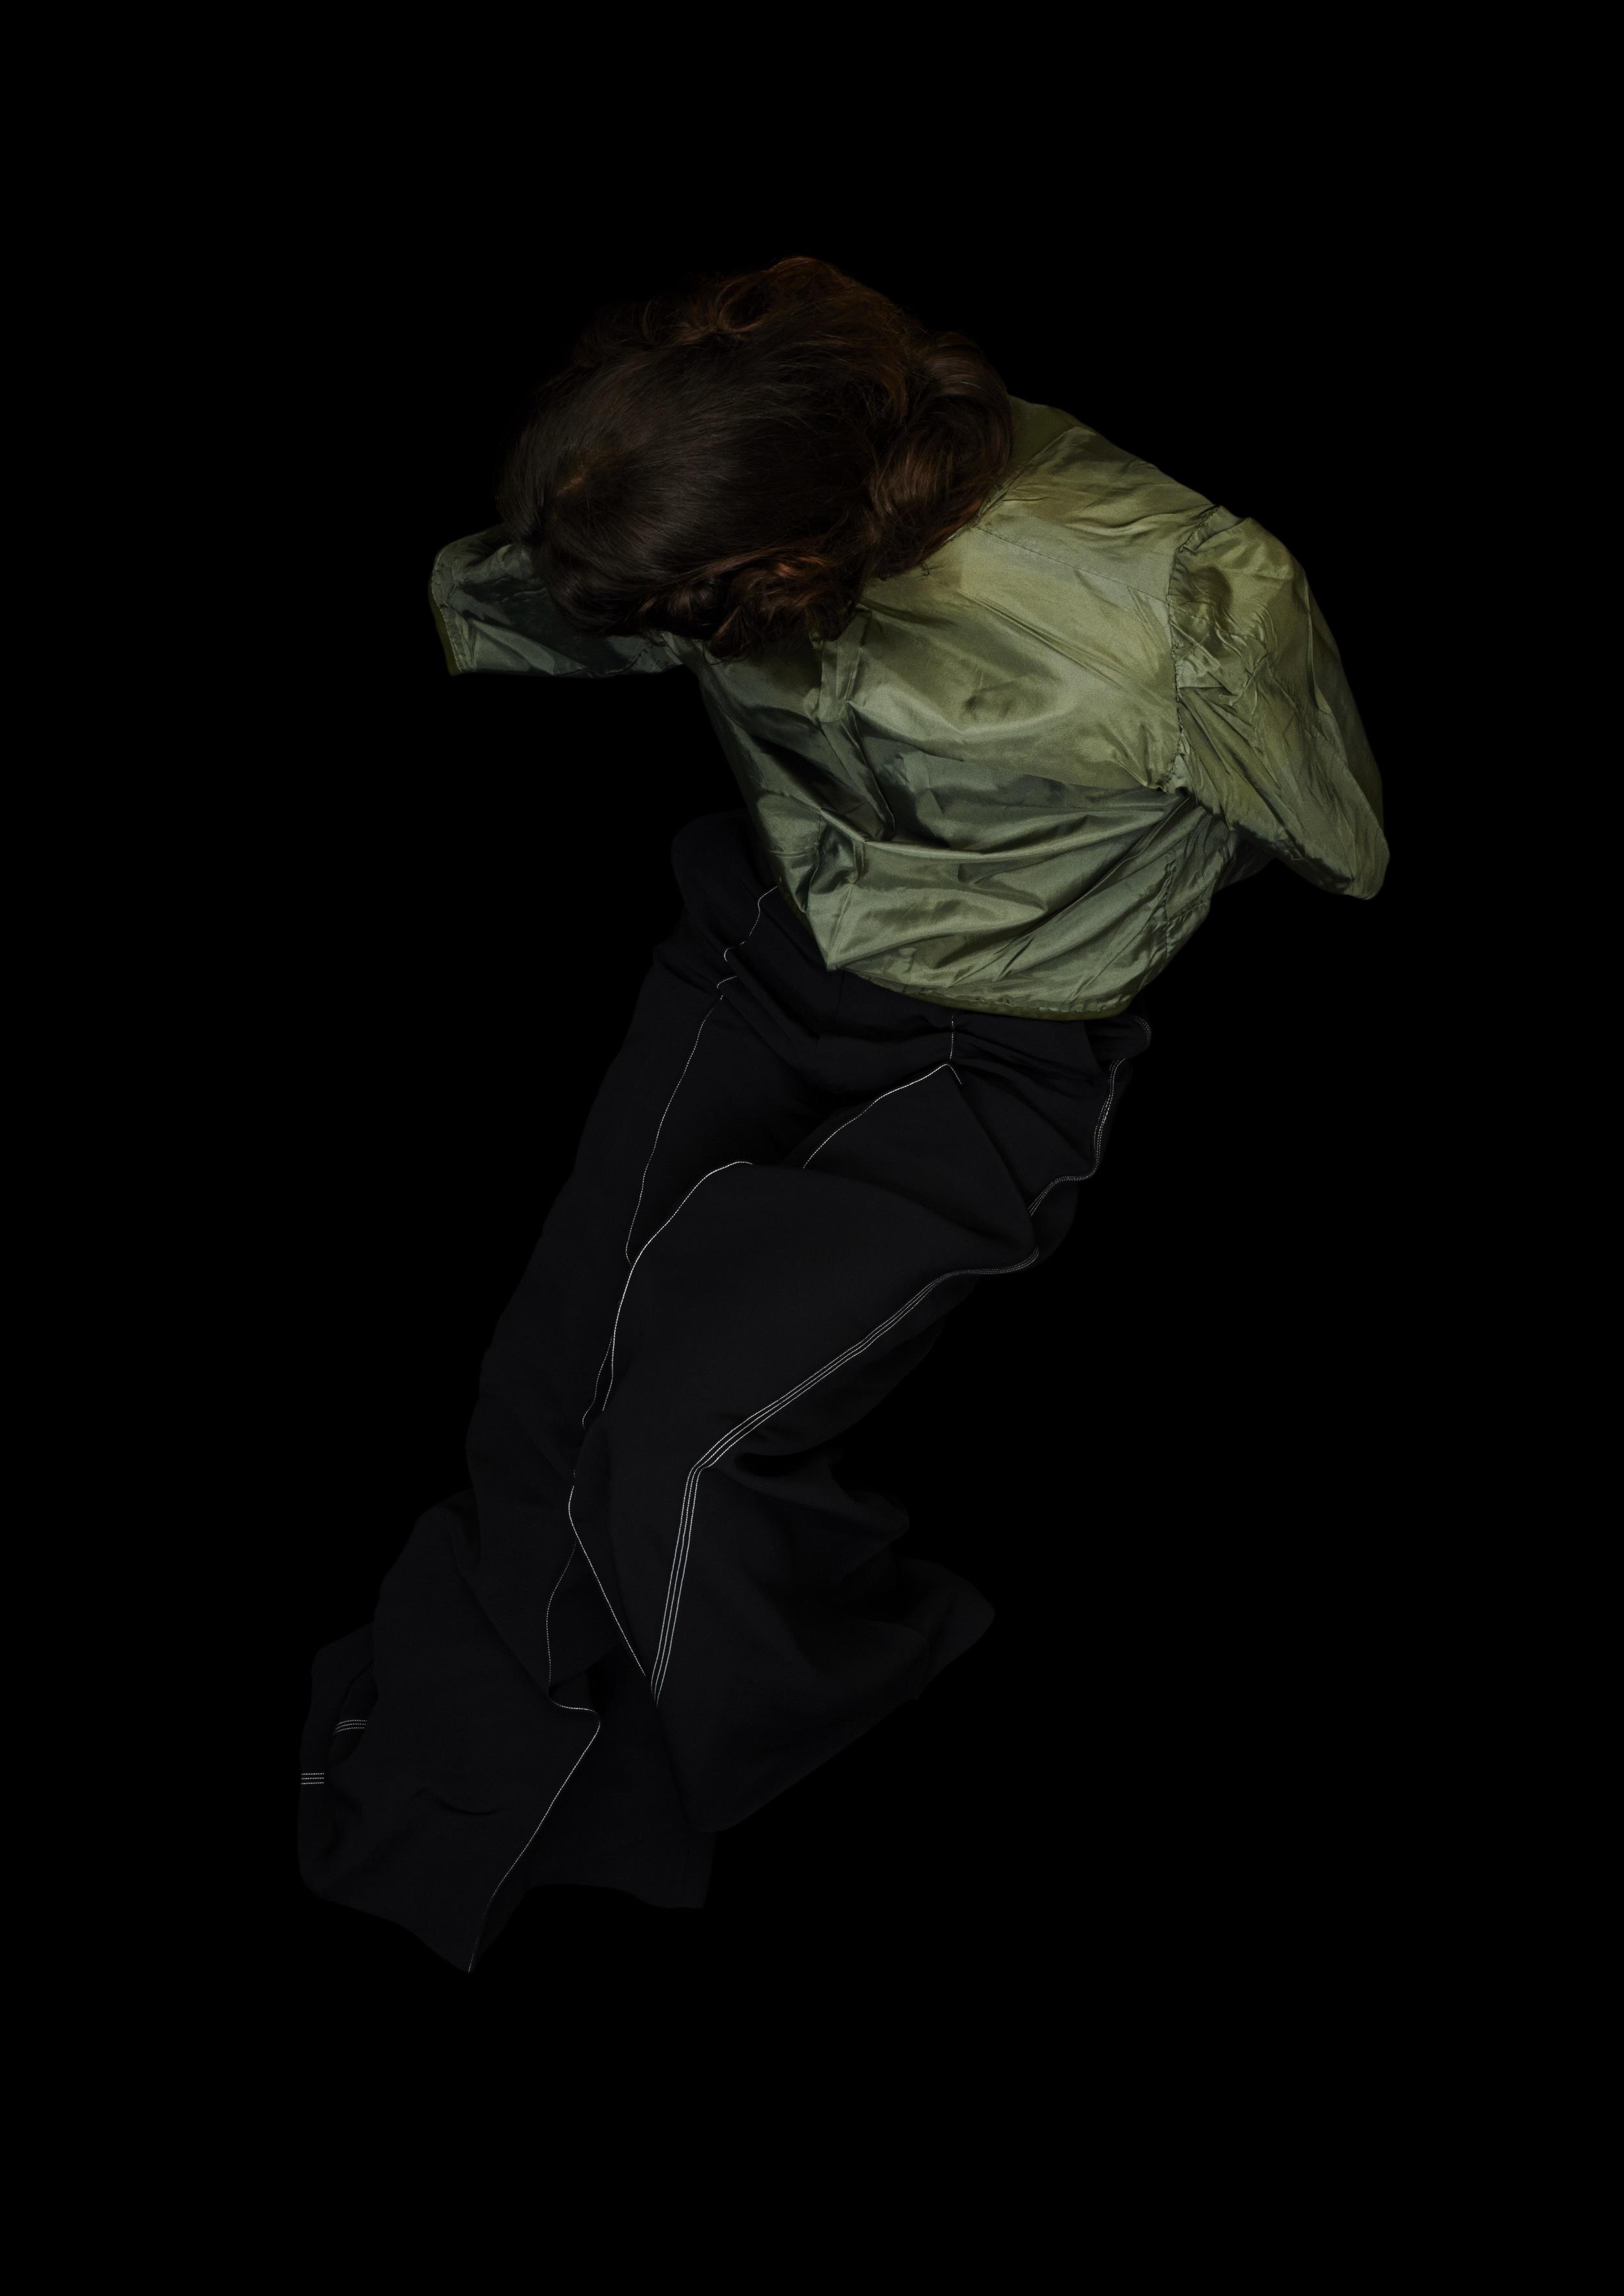 Black silk flare trousers  CÉLINE,  skirt worn backwards  FRANCO JACASSI VINTAGE DELIRIUM.